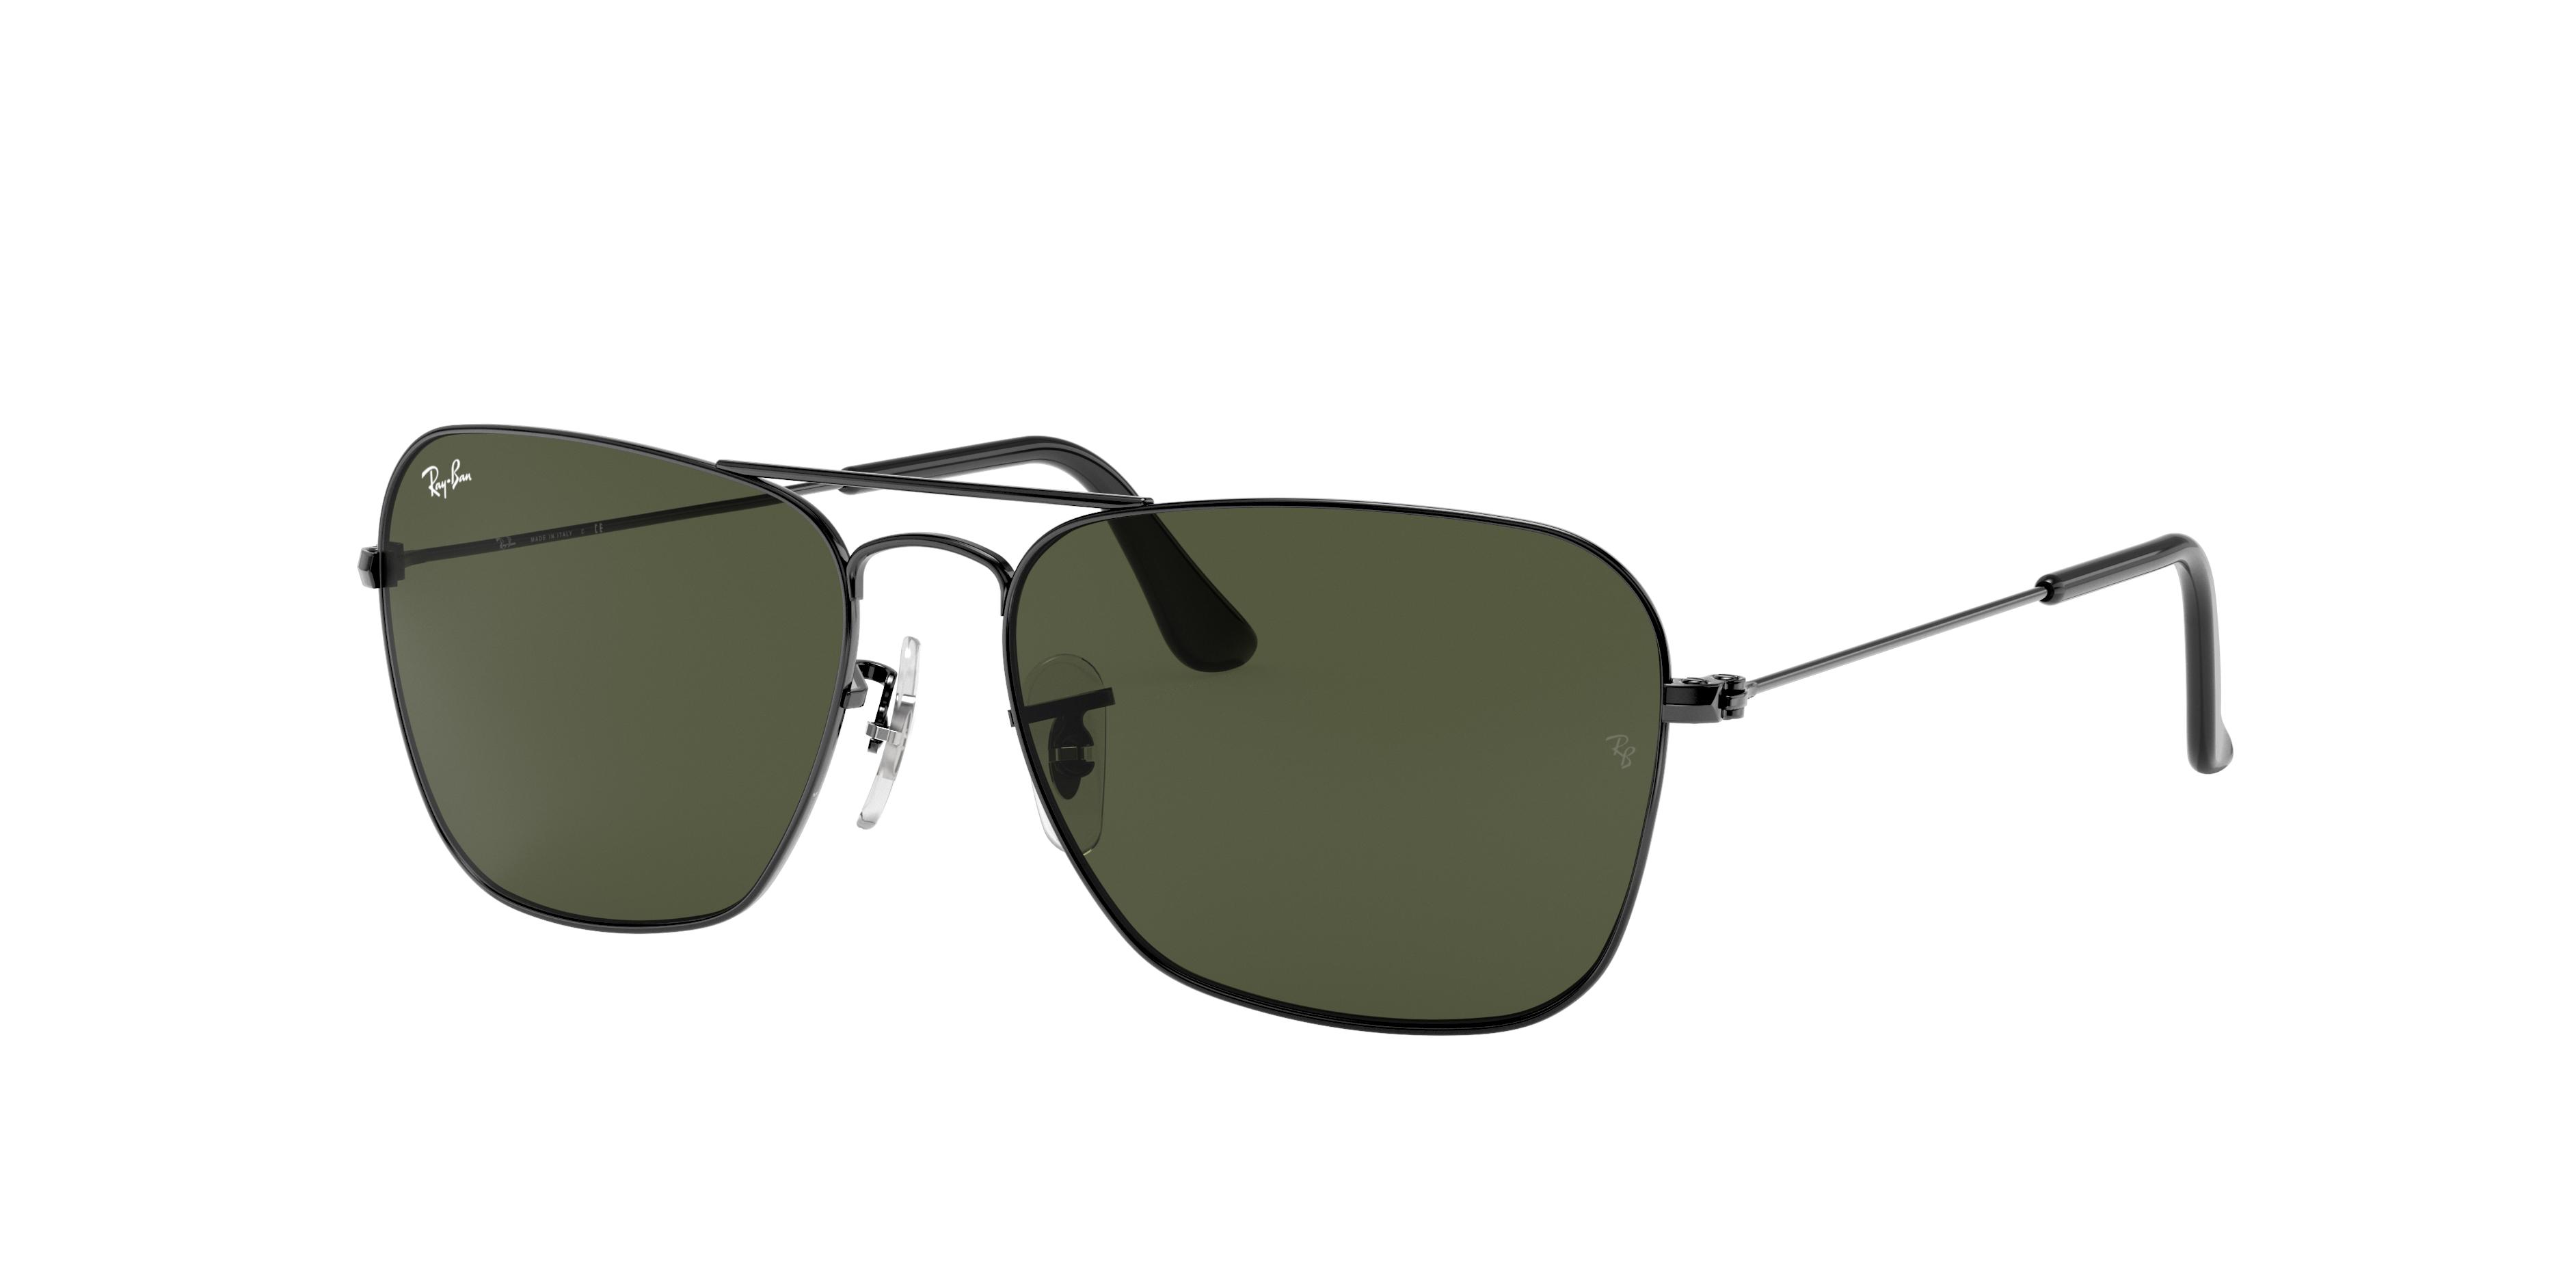 Ray-Ban Caravan Gunmetal, Green Lenses - RB3136